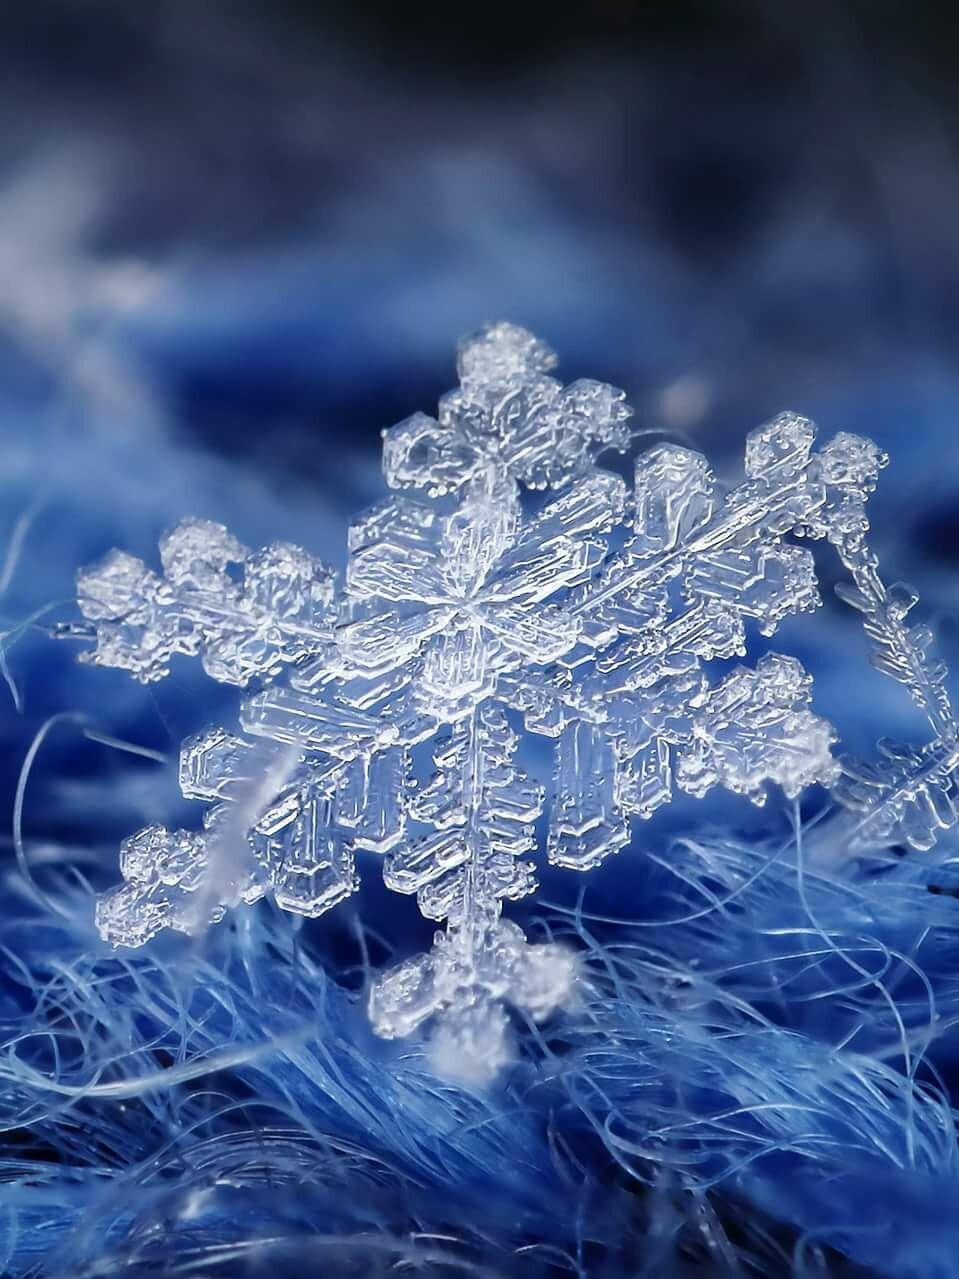 словам снежинка фото и картинка тарантула смертелен, может